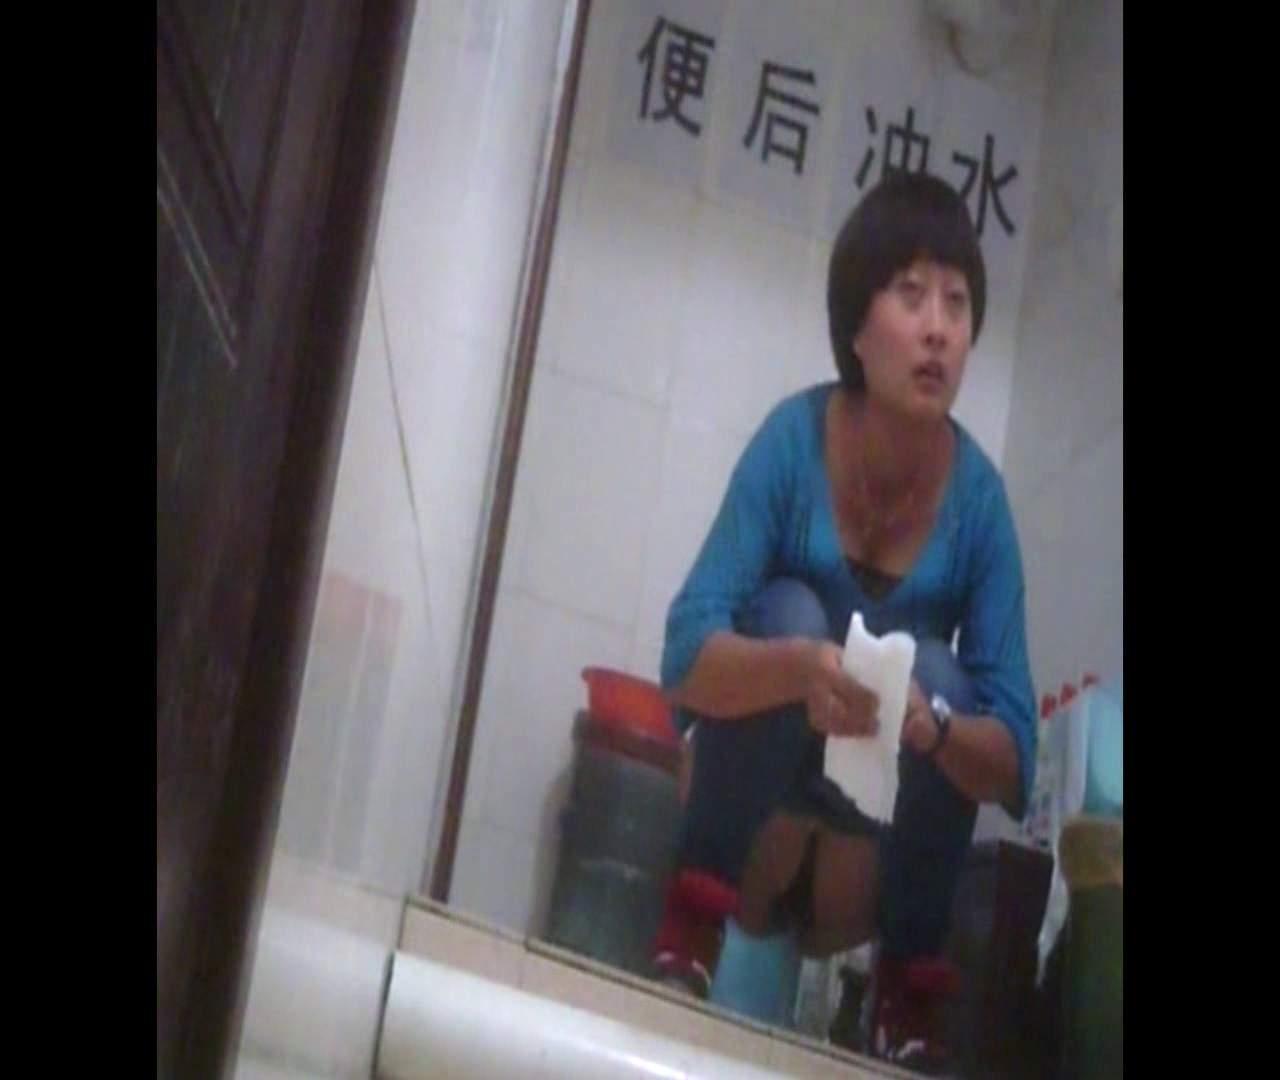 Vol.37 豊満な胸を持つマッシュルームカットな彼女 洗面所のぞき 性交動画流出 109枚 50